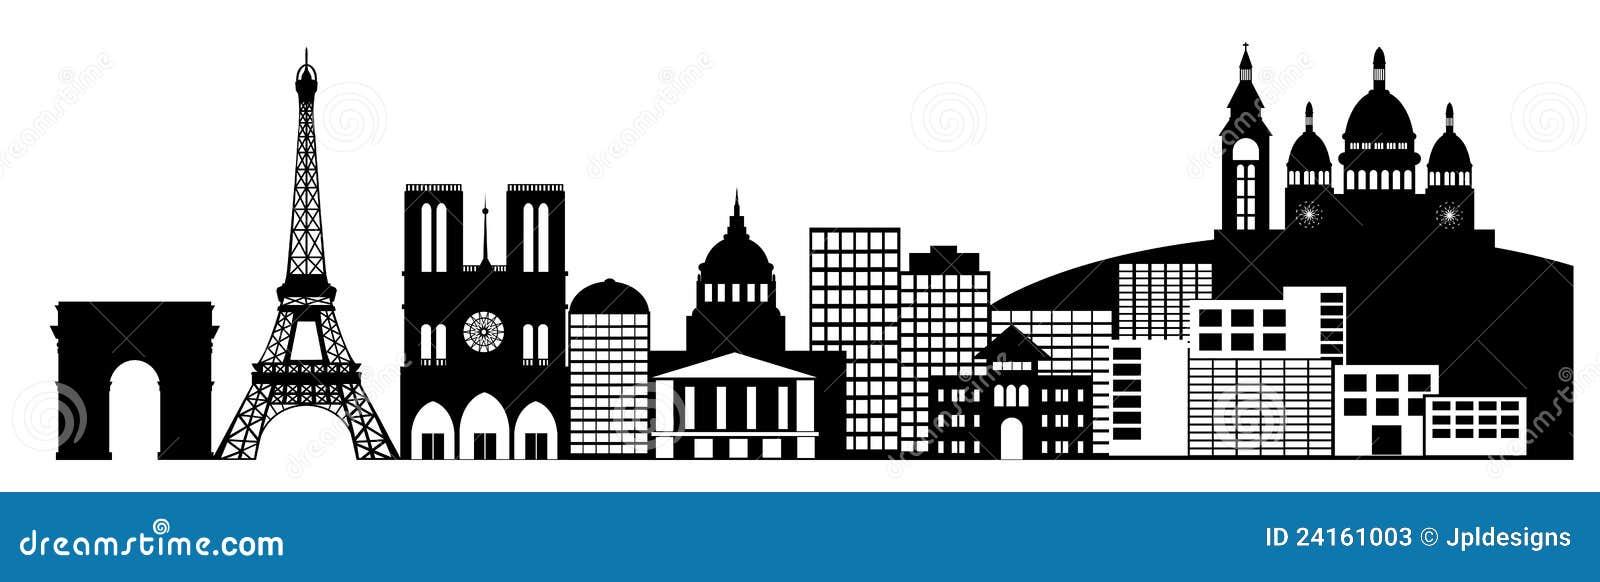 Paris france city skyline panorama black and white silhouette clip art